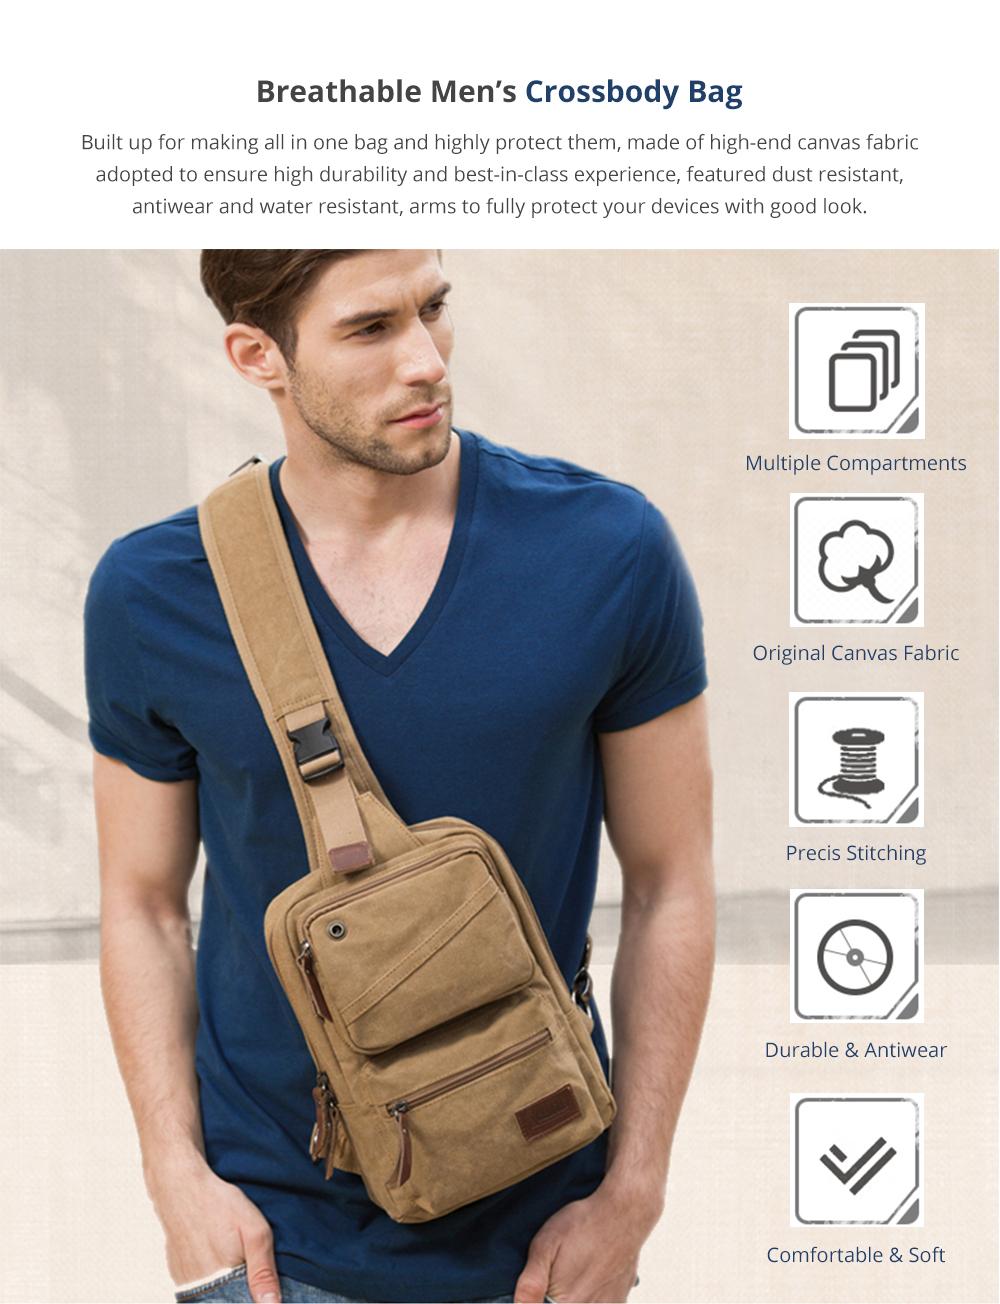 Breathable Men's Crossbody Bag